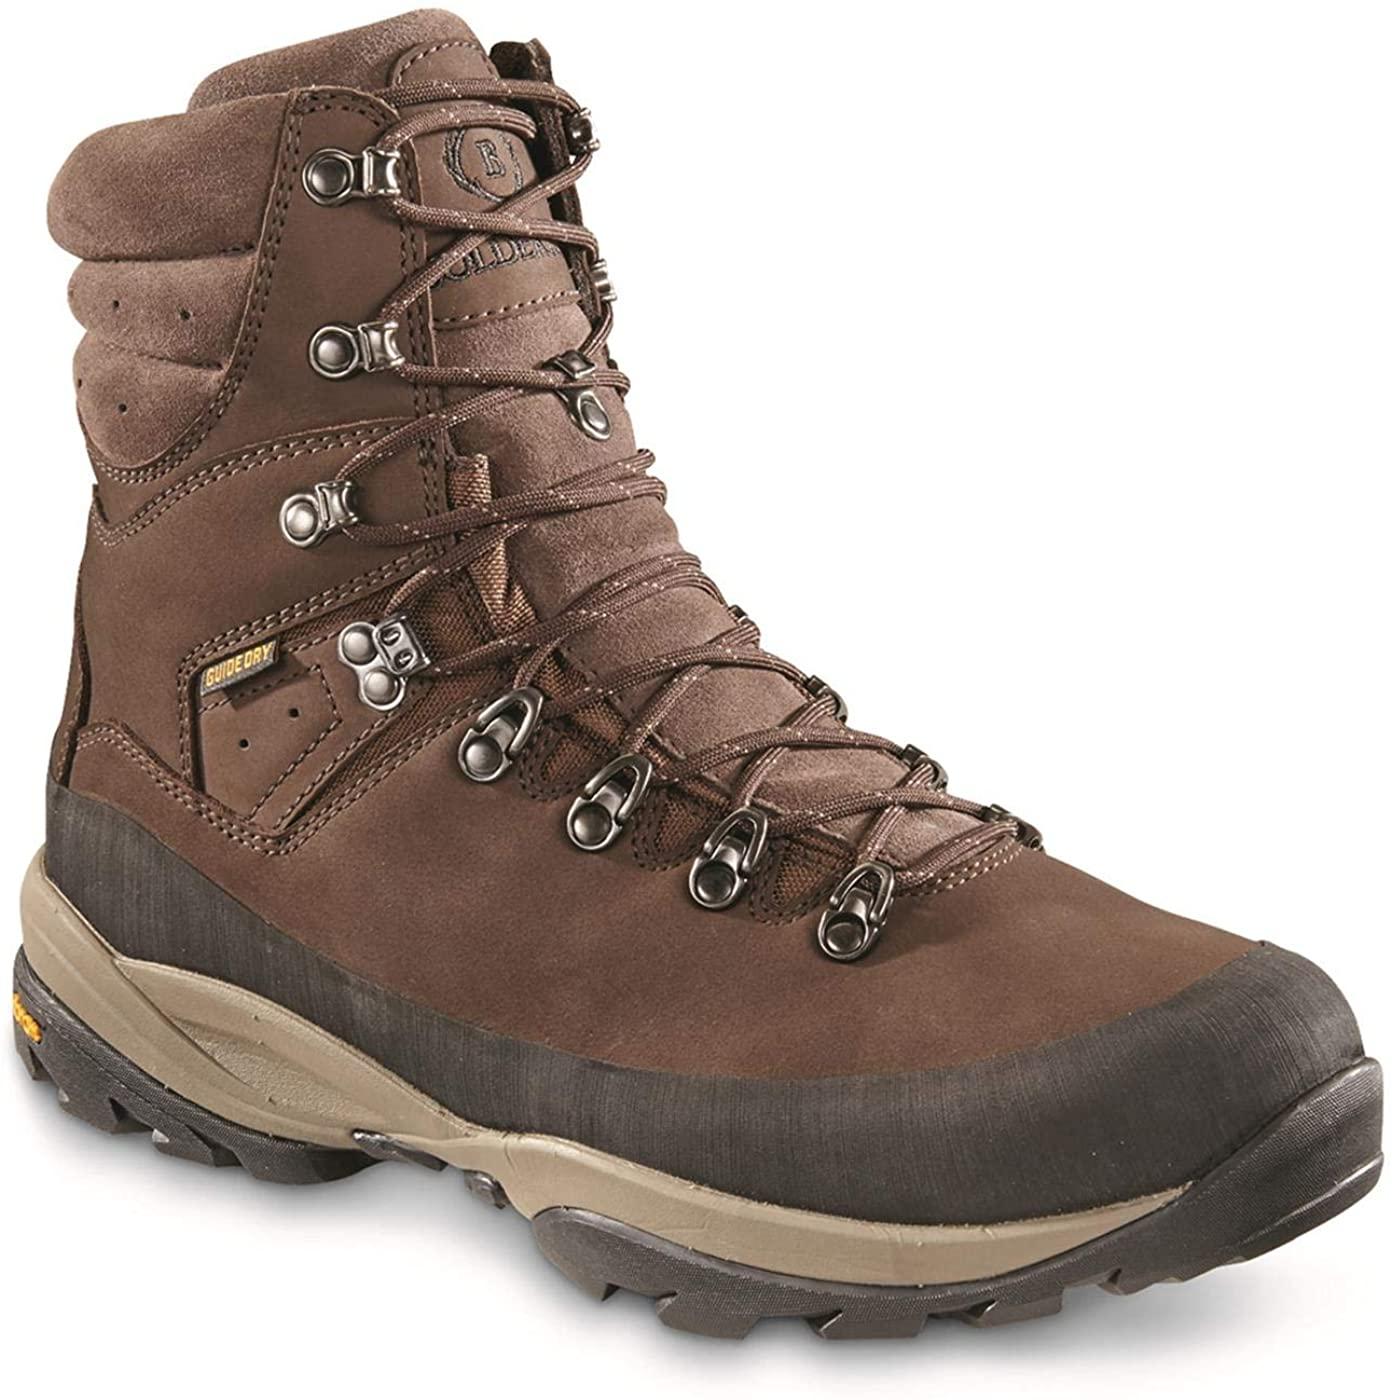 Bolderton Mens Ridge 8 Waterproof Hunting Boots